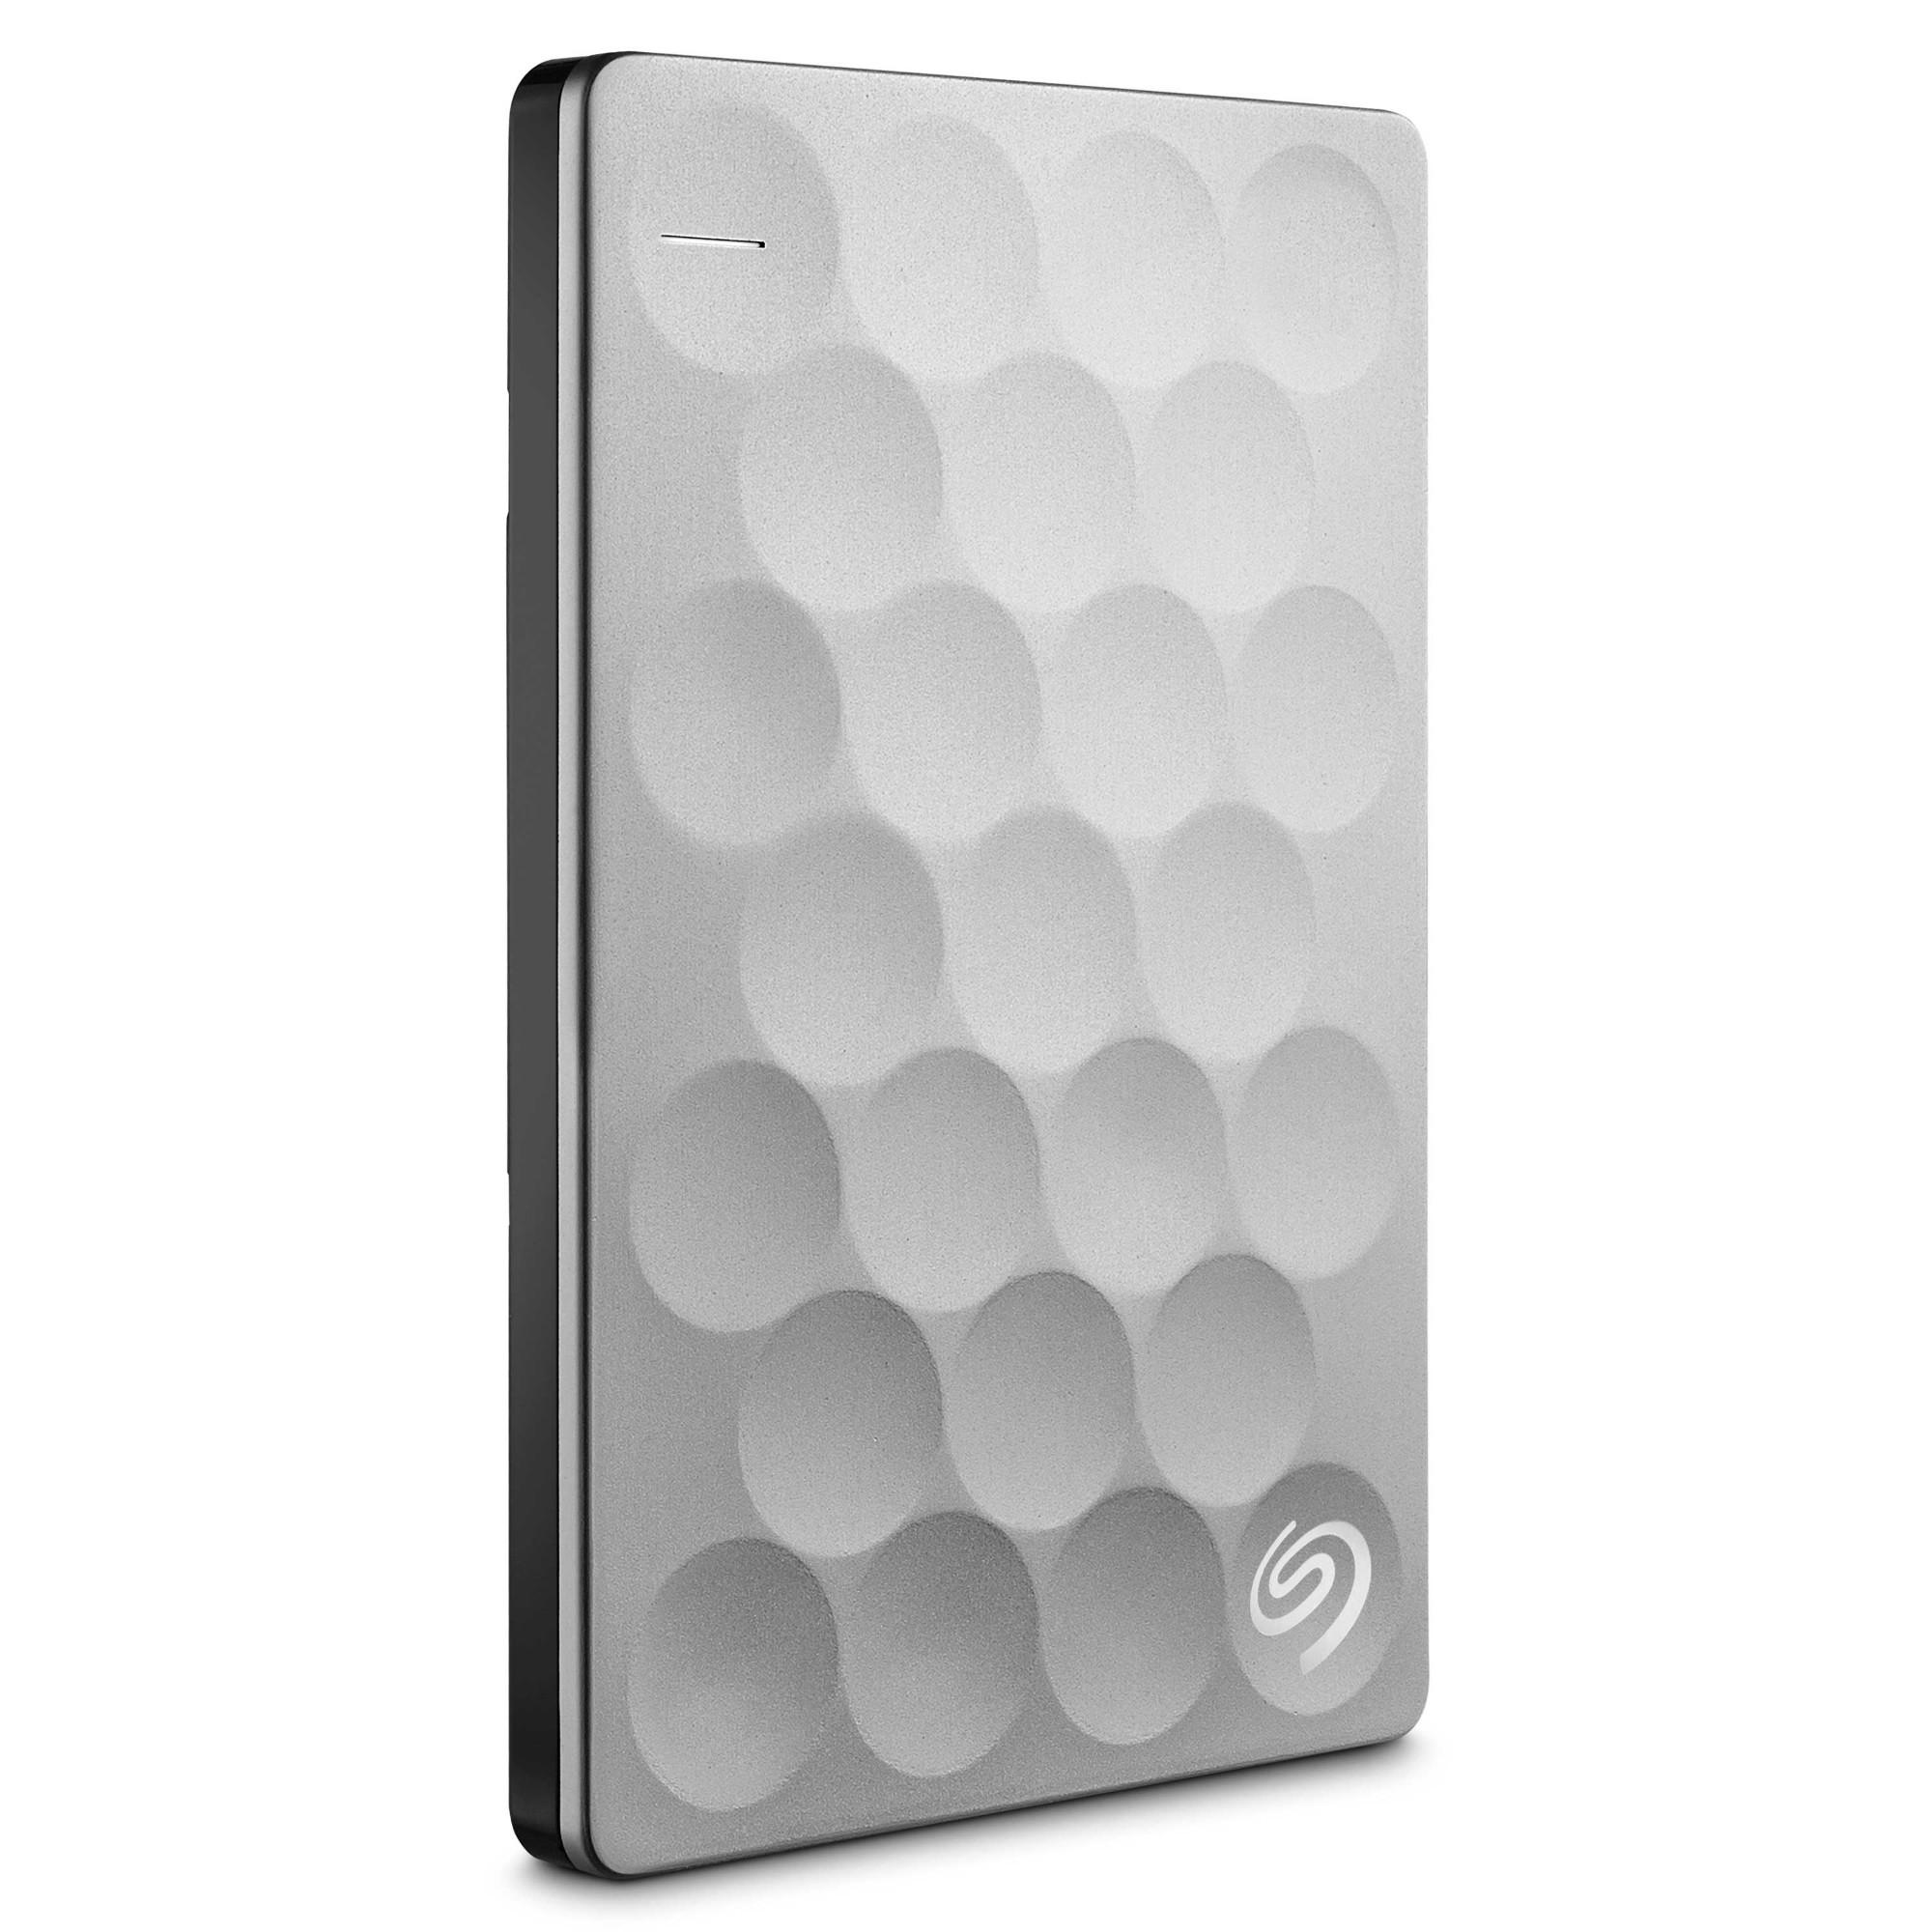 Seagate Backup Plus Ultra Slim external hard drive 2000 GB Platinum